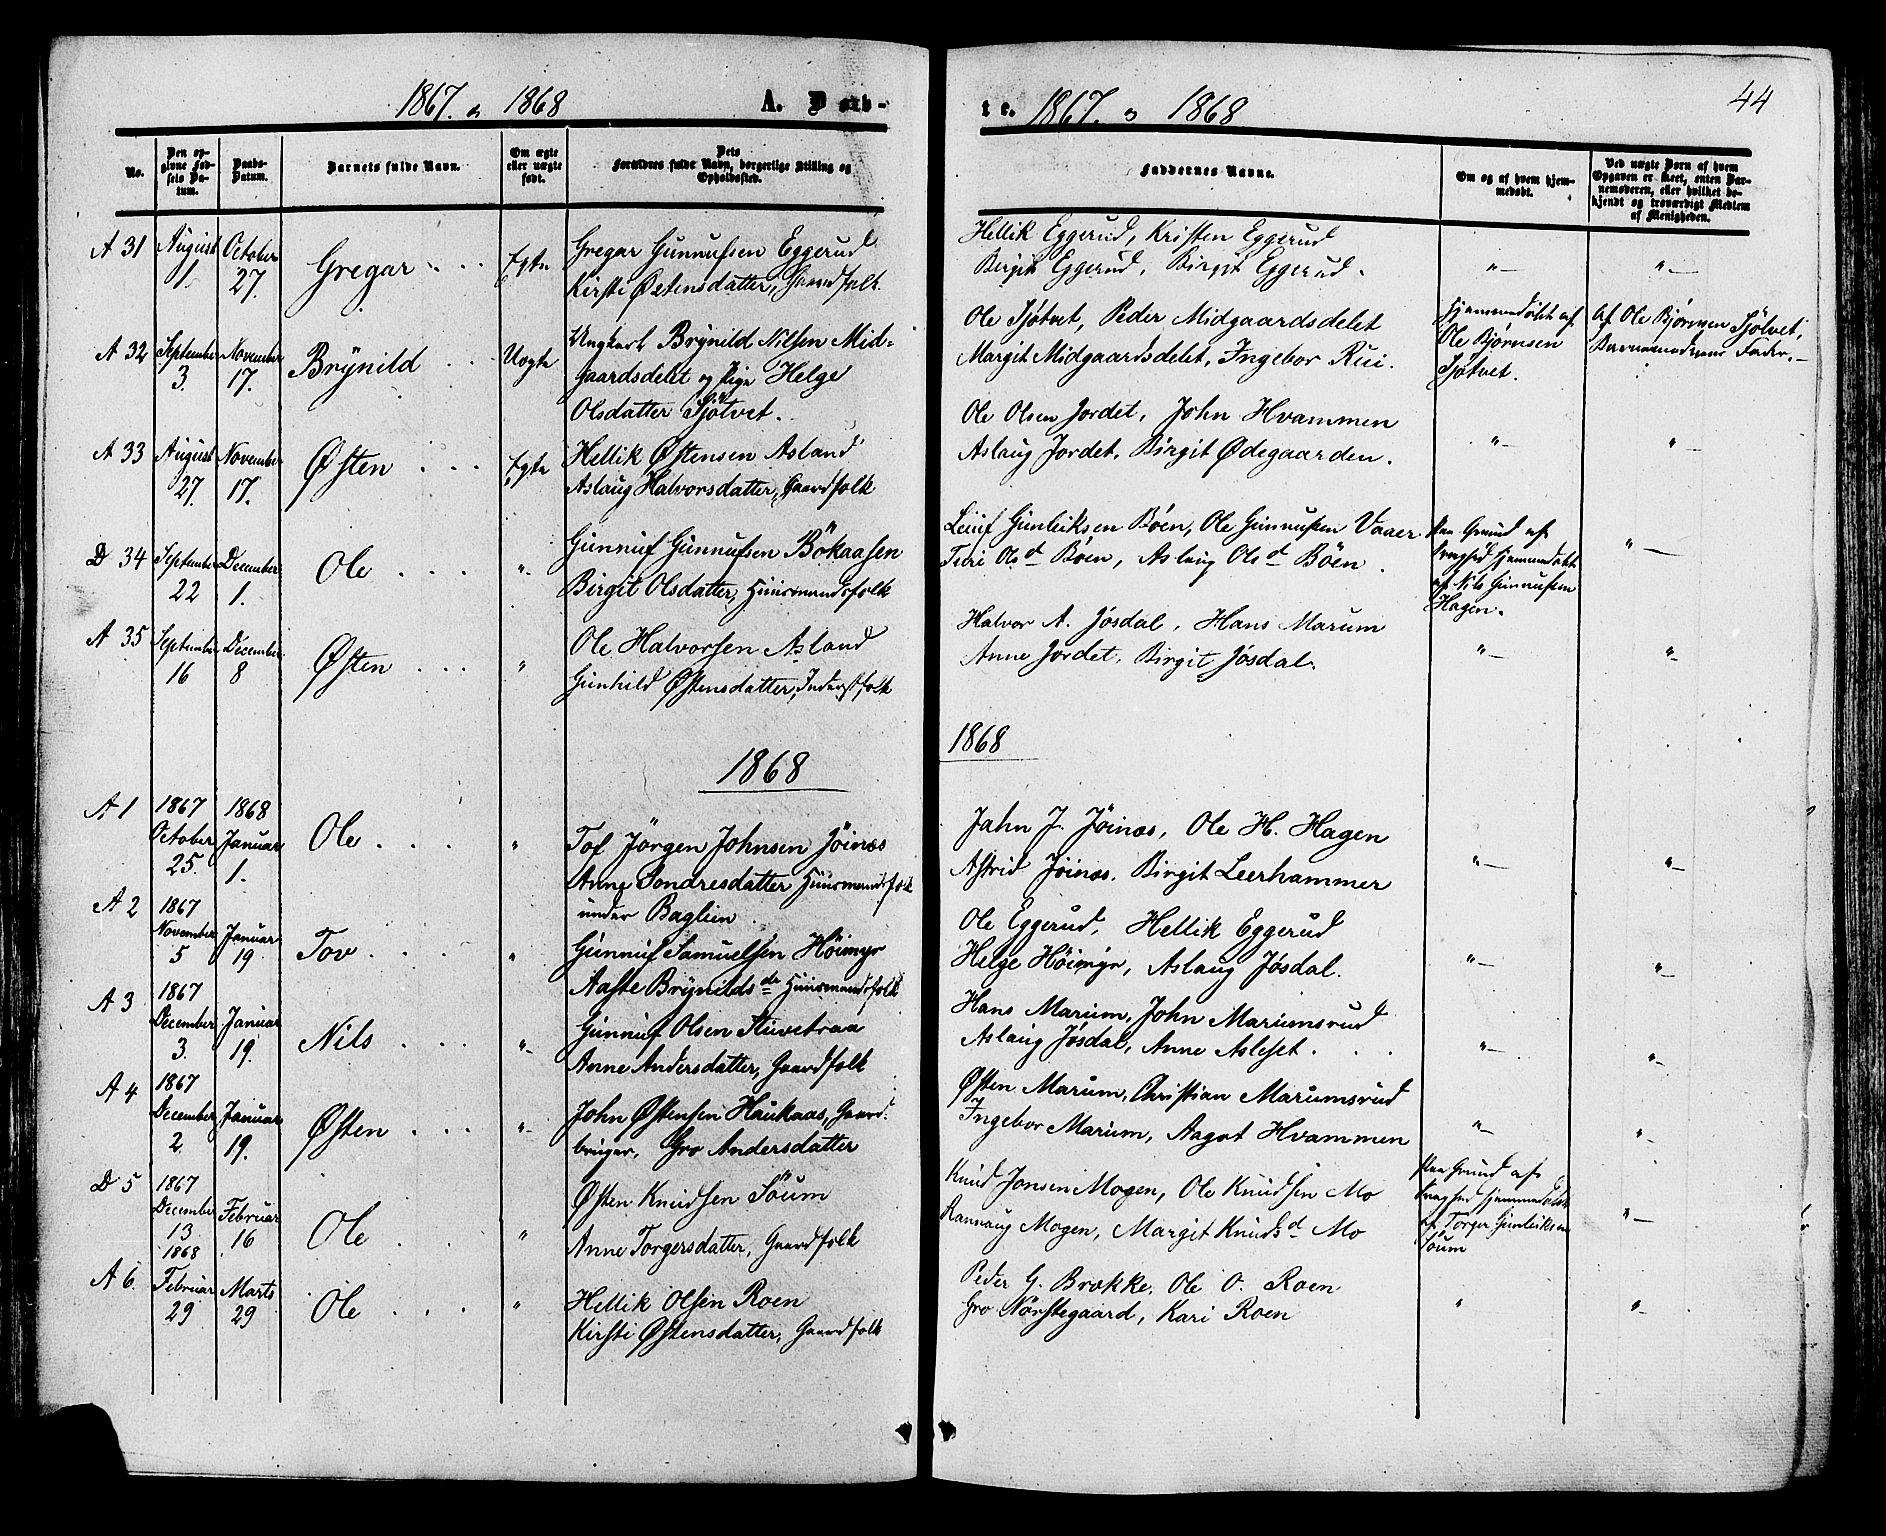 SAKO, Tinn kirkebøker, F/Fa/L0006: Ministerialbok nr. I 6, 1857-1878, s. 44